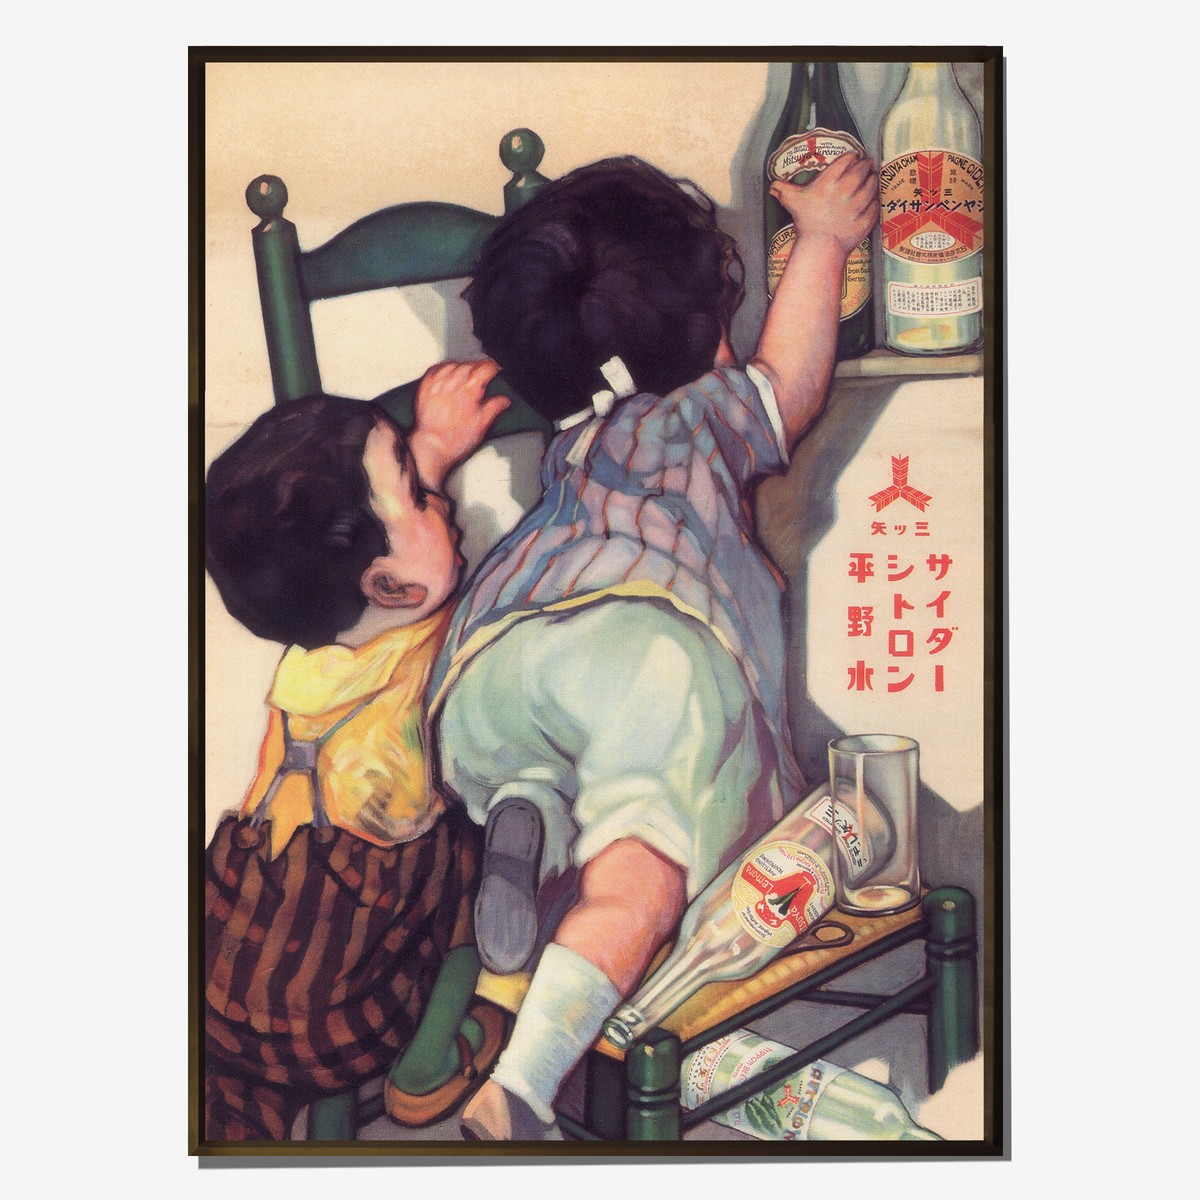 Photo of Mitsuya Cider Vintage Advertising Poster